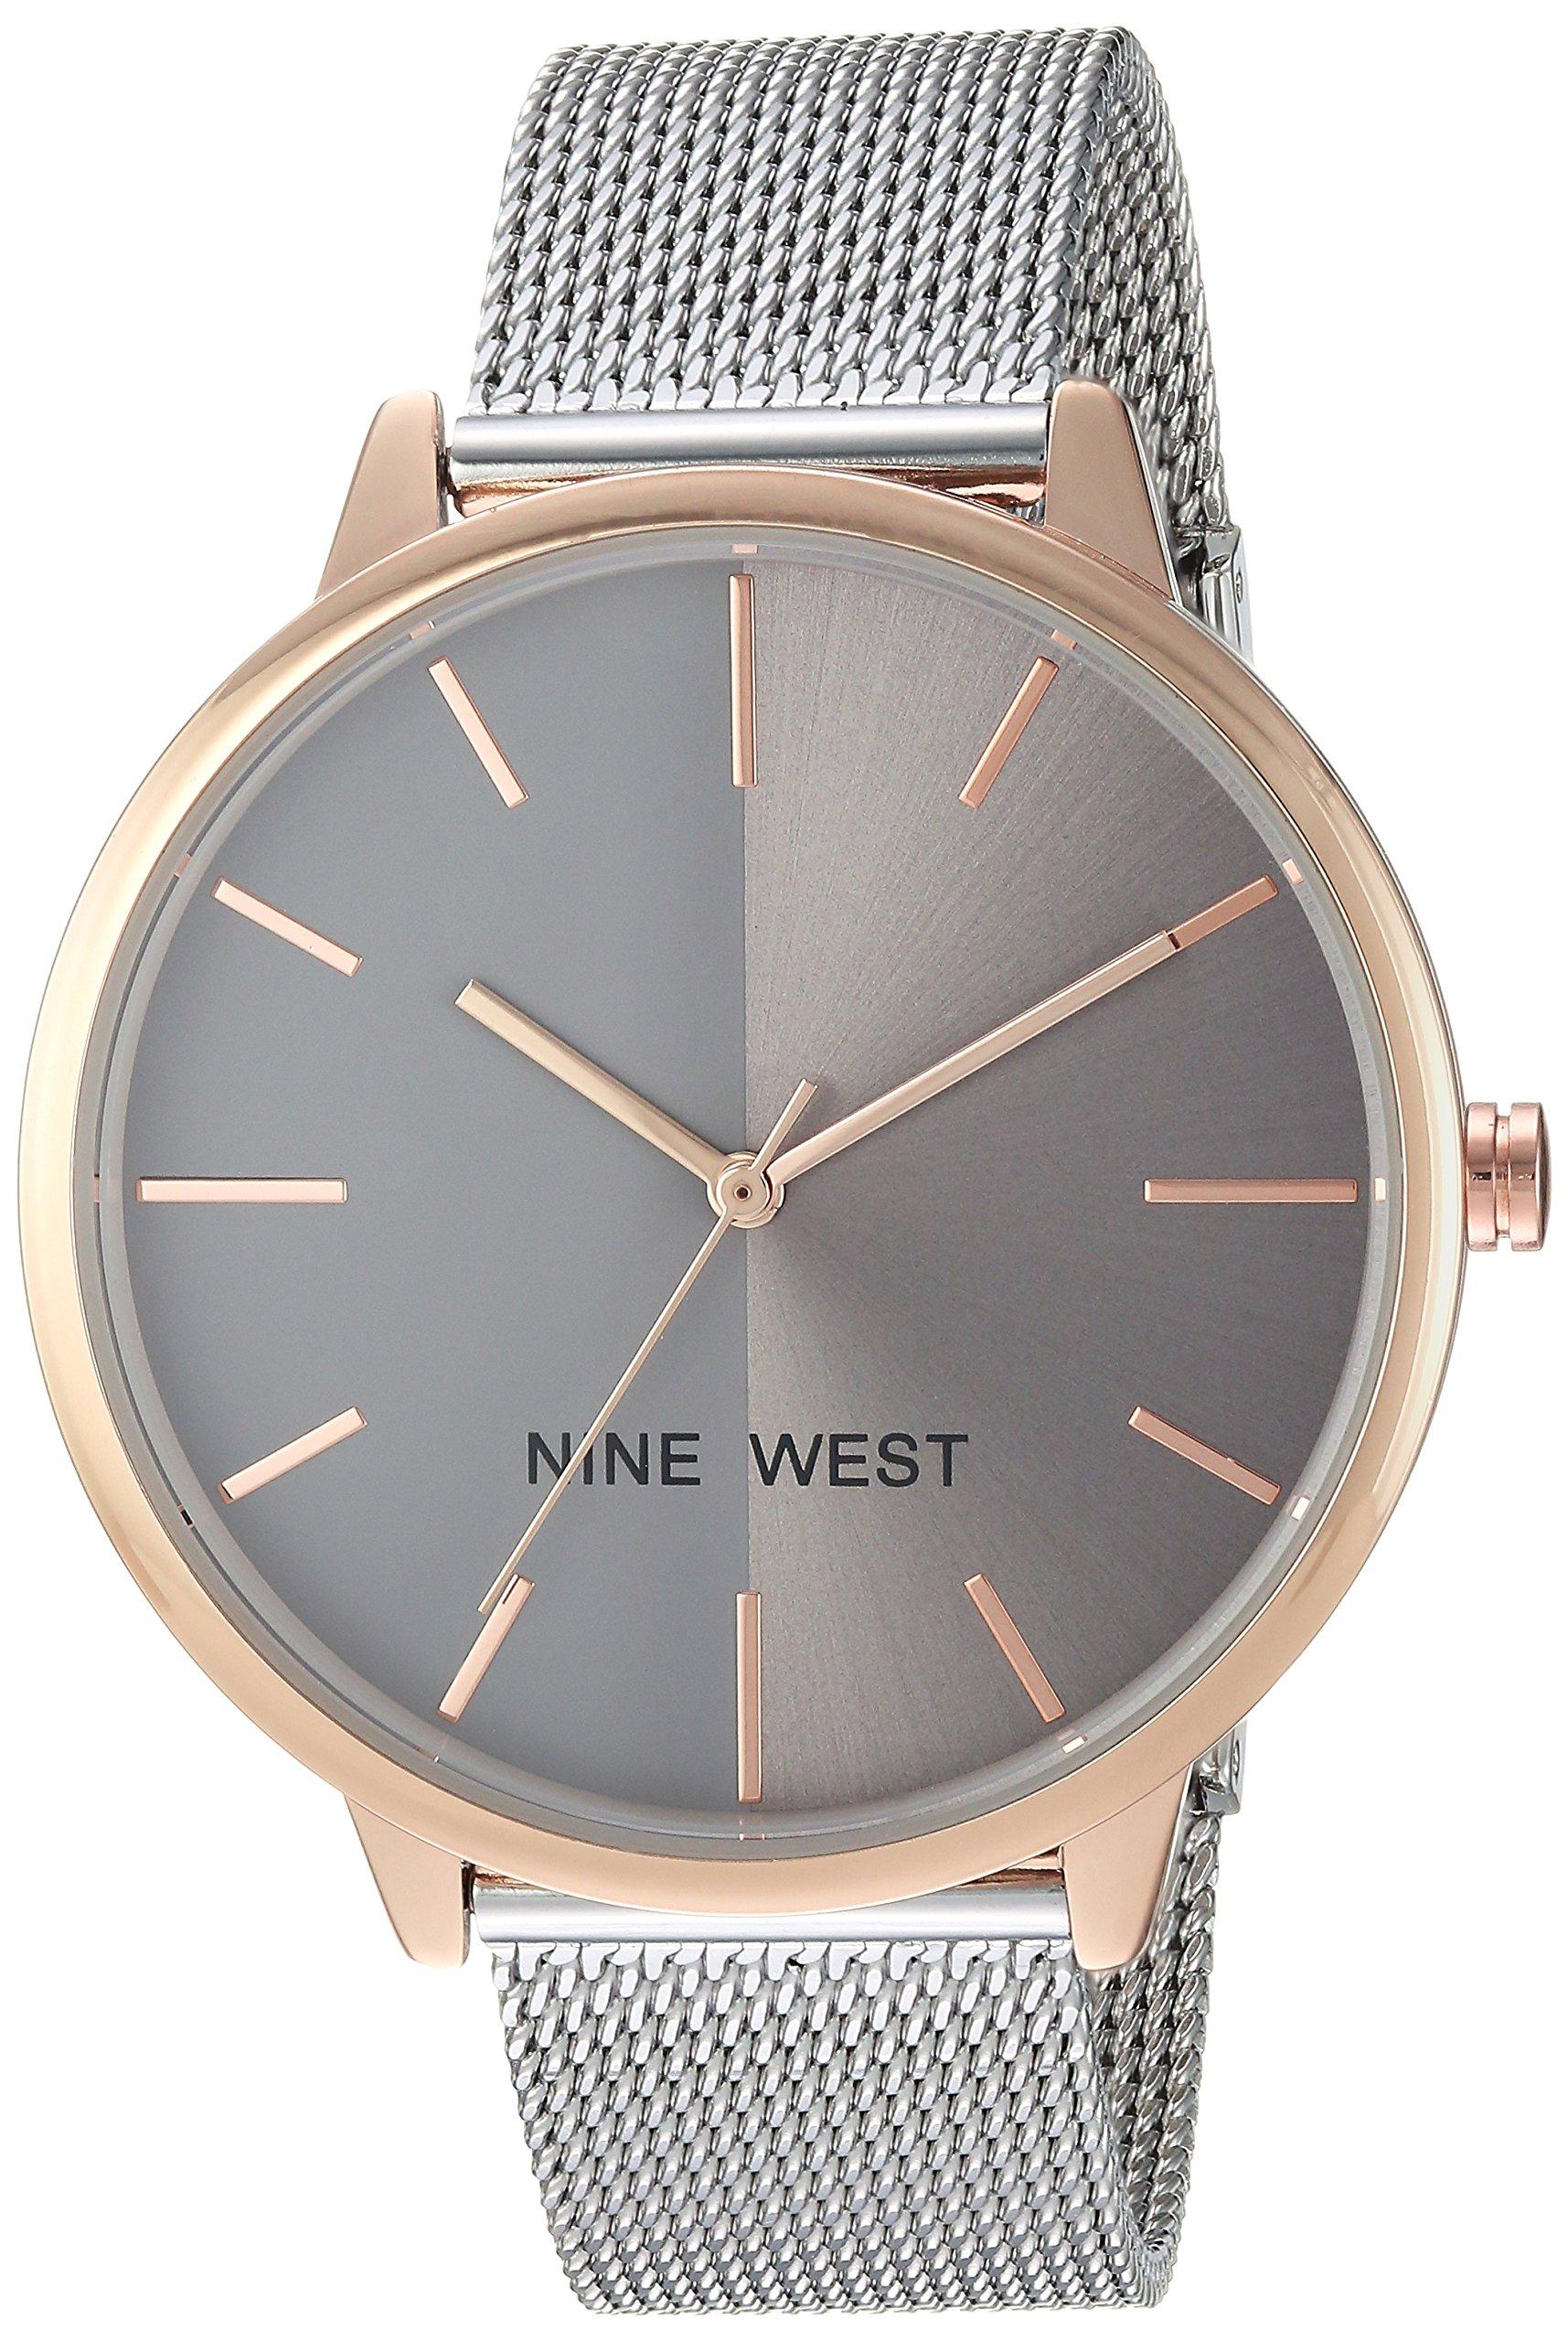 Nine West Women's NW/1981GYRT Silver-Tone Mesh Bracelet Watch by Nine West